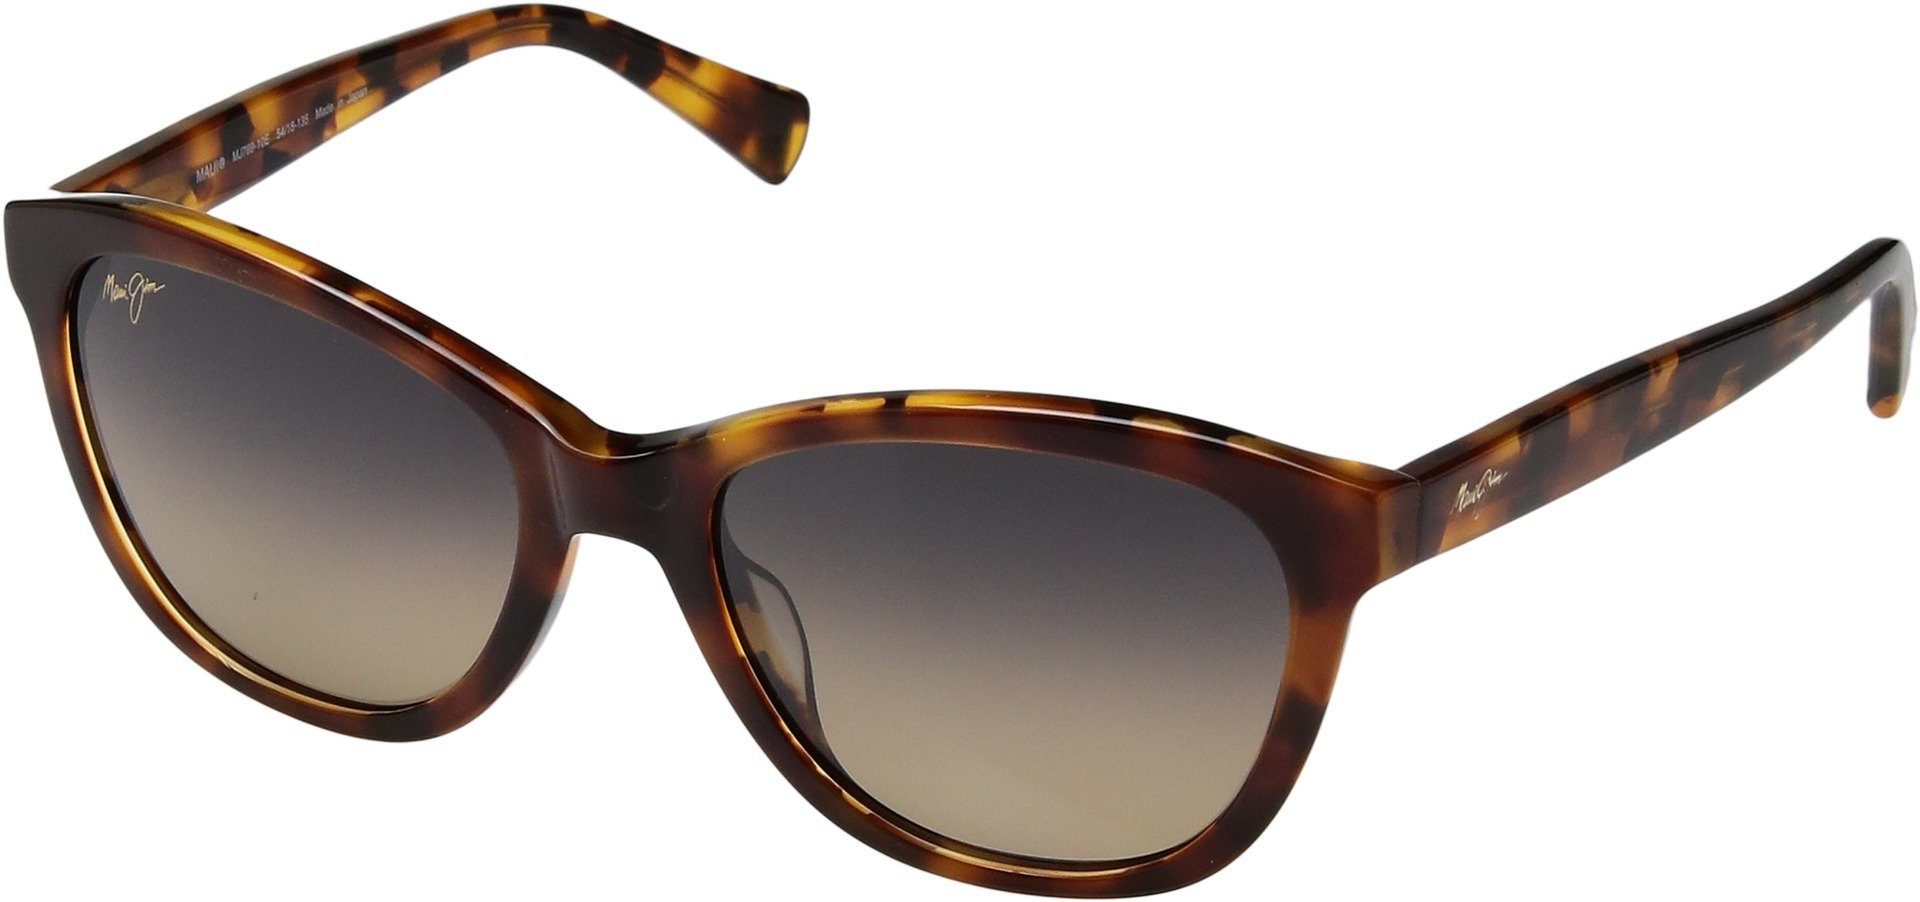 Maui Jim Womens Sunglasses Tortoise/Bronze Acetate - Polarized - 54mm